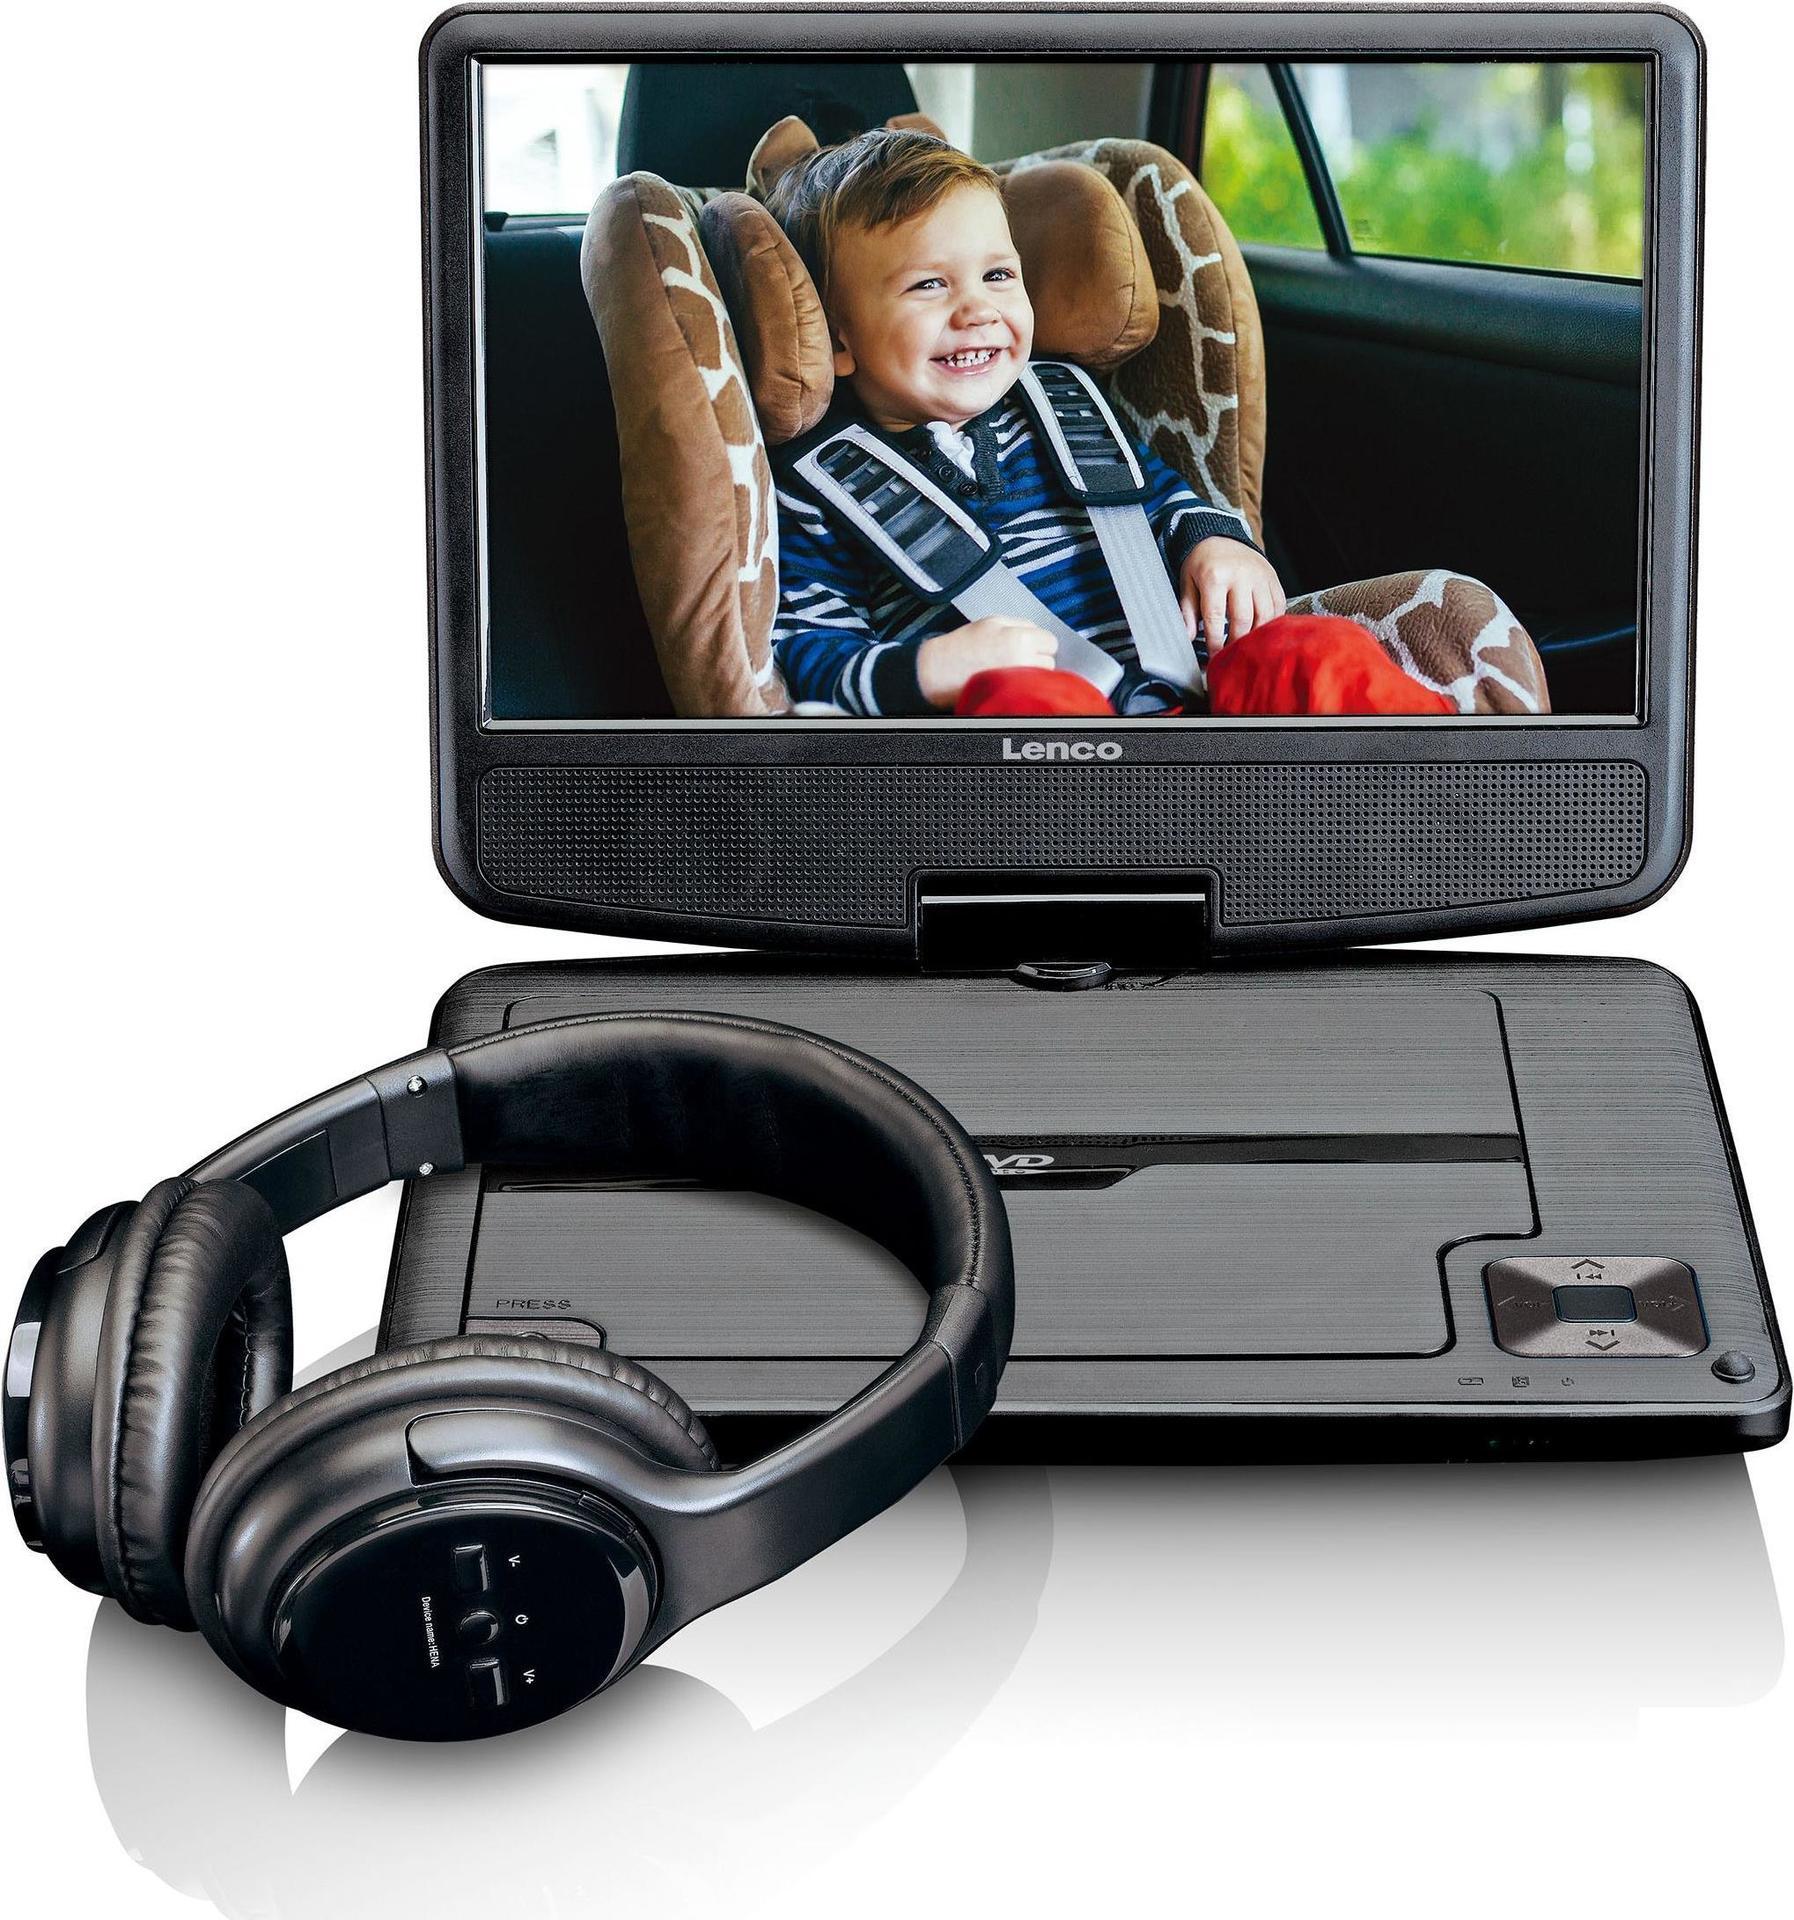 DVD Player, Blu Ray - Lenco DVP 947 Portable DVD player Tisch 22,90cm (9) 802 x 480Pixel Schwarz Tragbarer DVD Blu Ray Player (DCP947BK)  - Onlineshop JACOB Elektronik